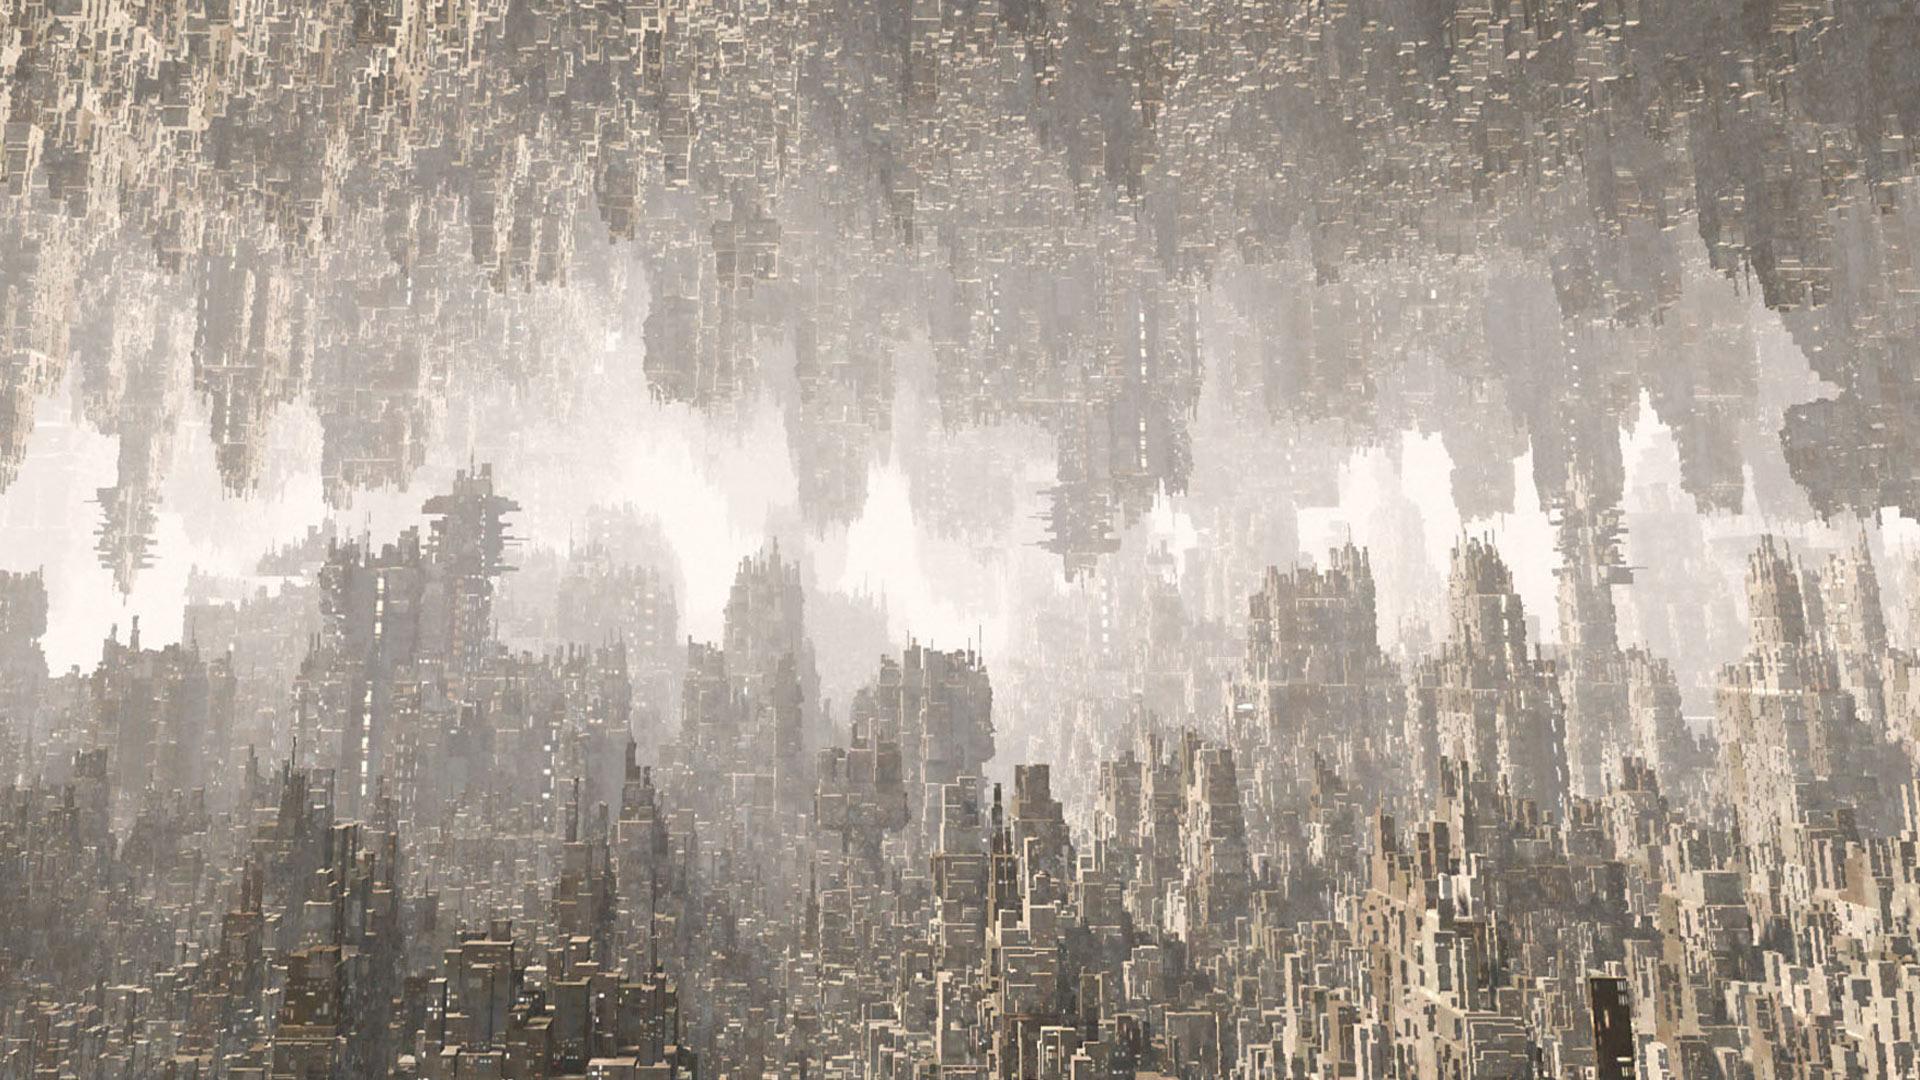 3dmark-api-overhead-screenshot.jpg